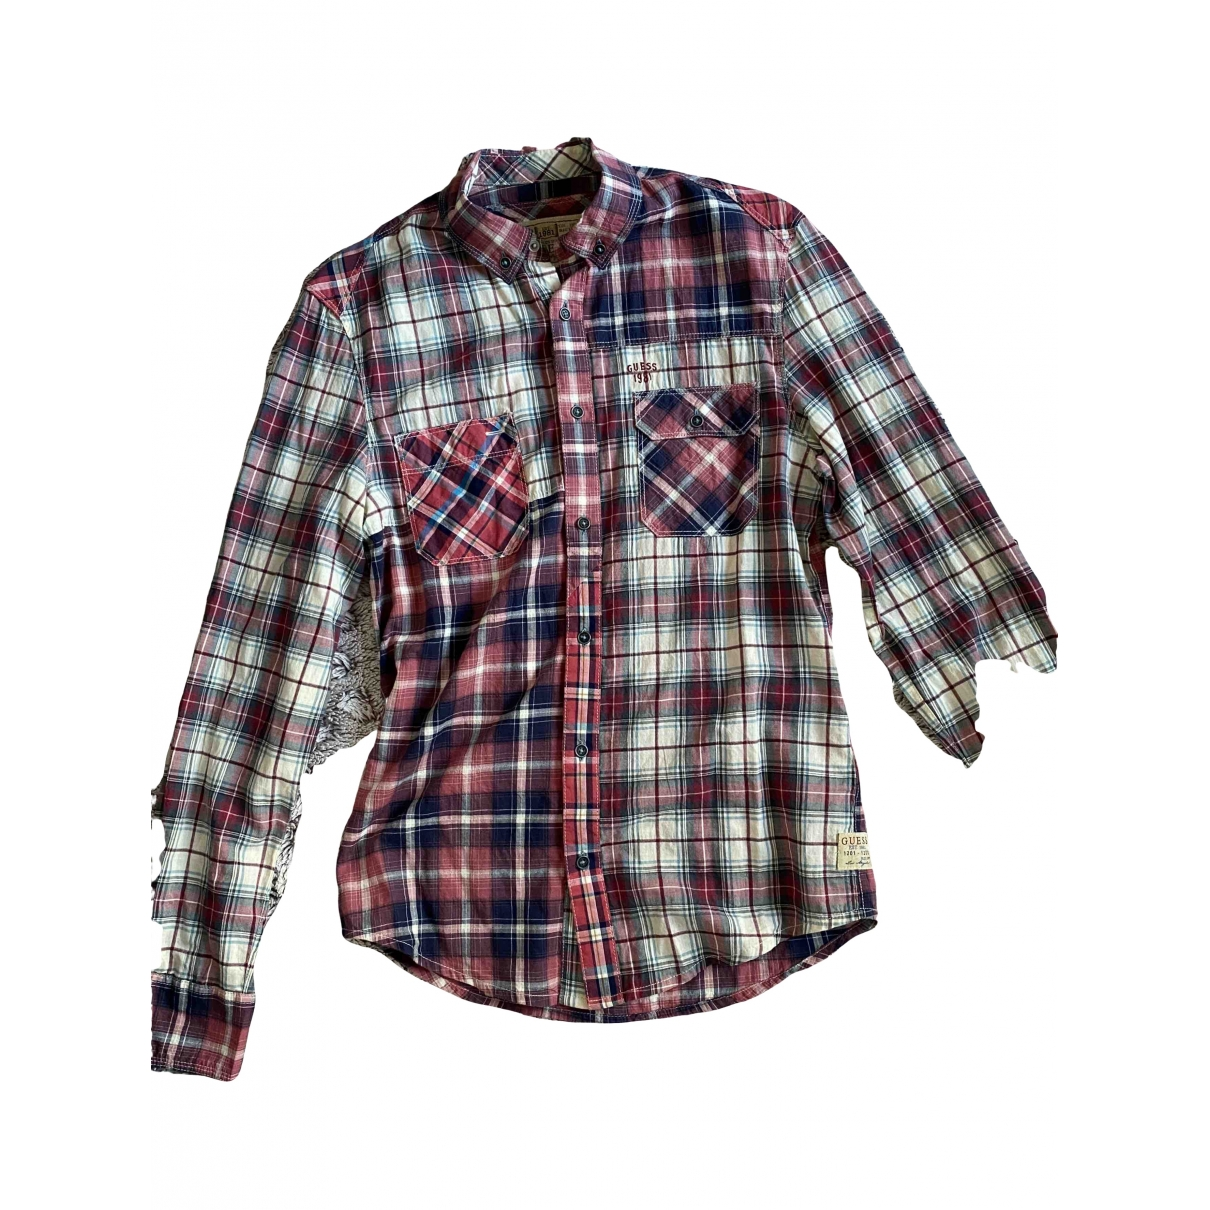 Guess \N Cotton Shirts for Men XS International